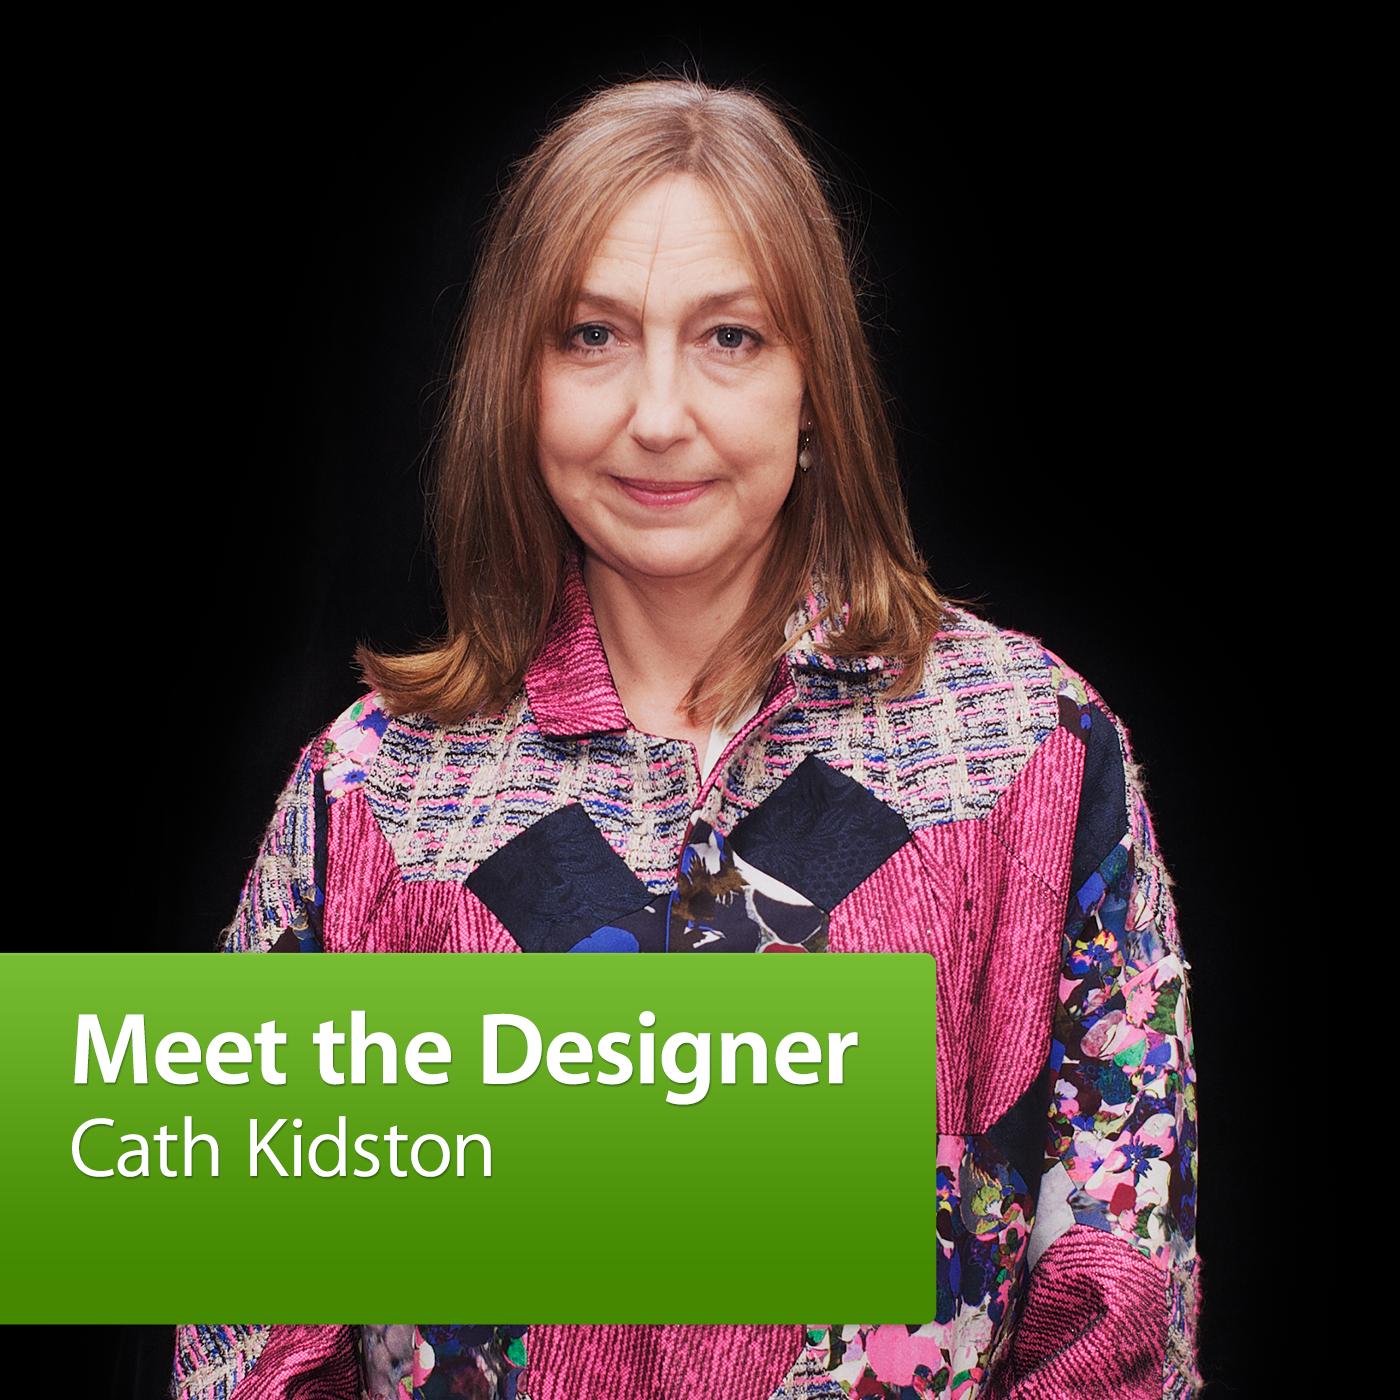 Cath Kidston: Meet the Designer